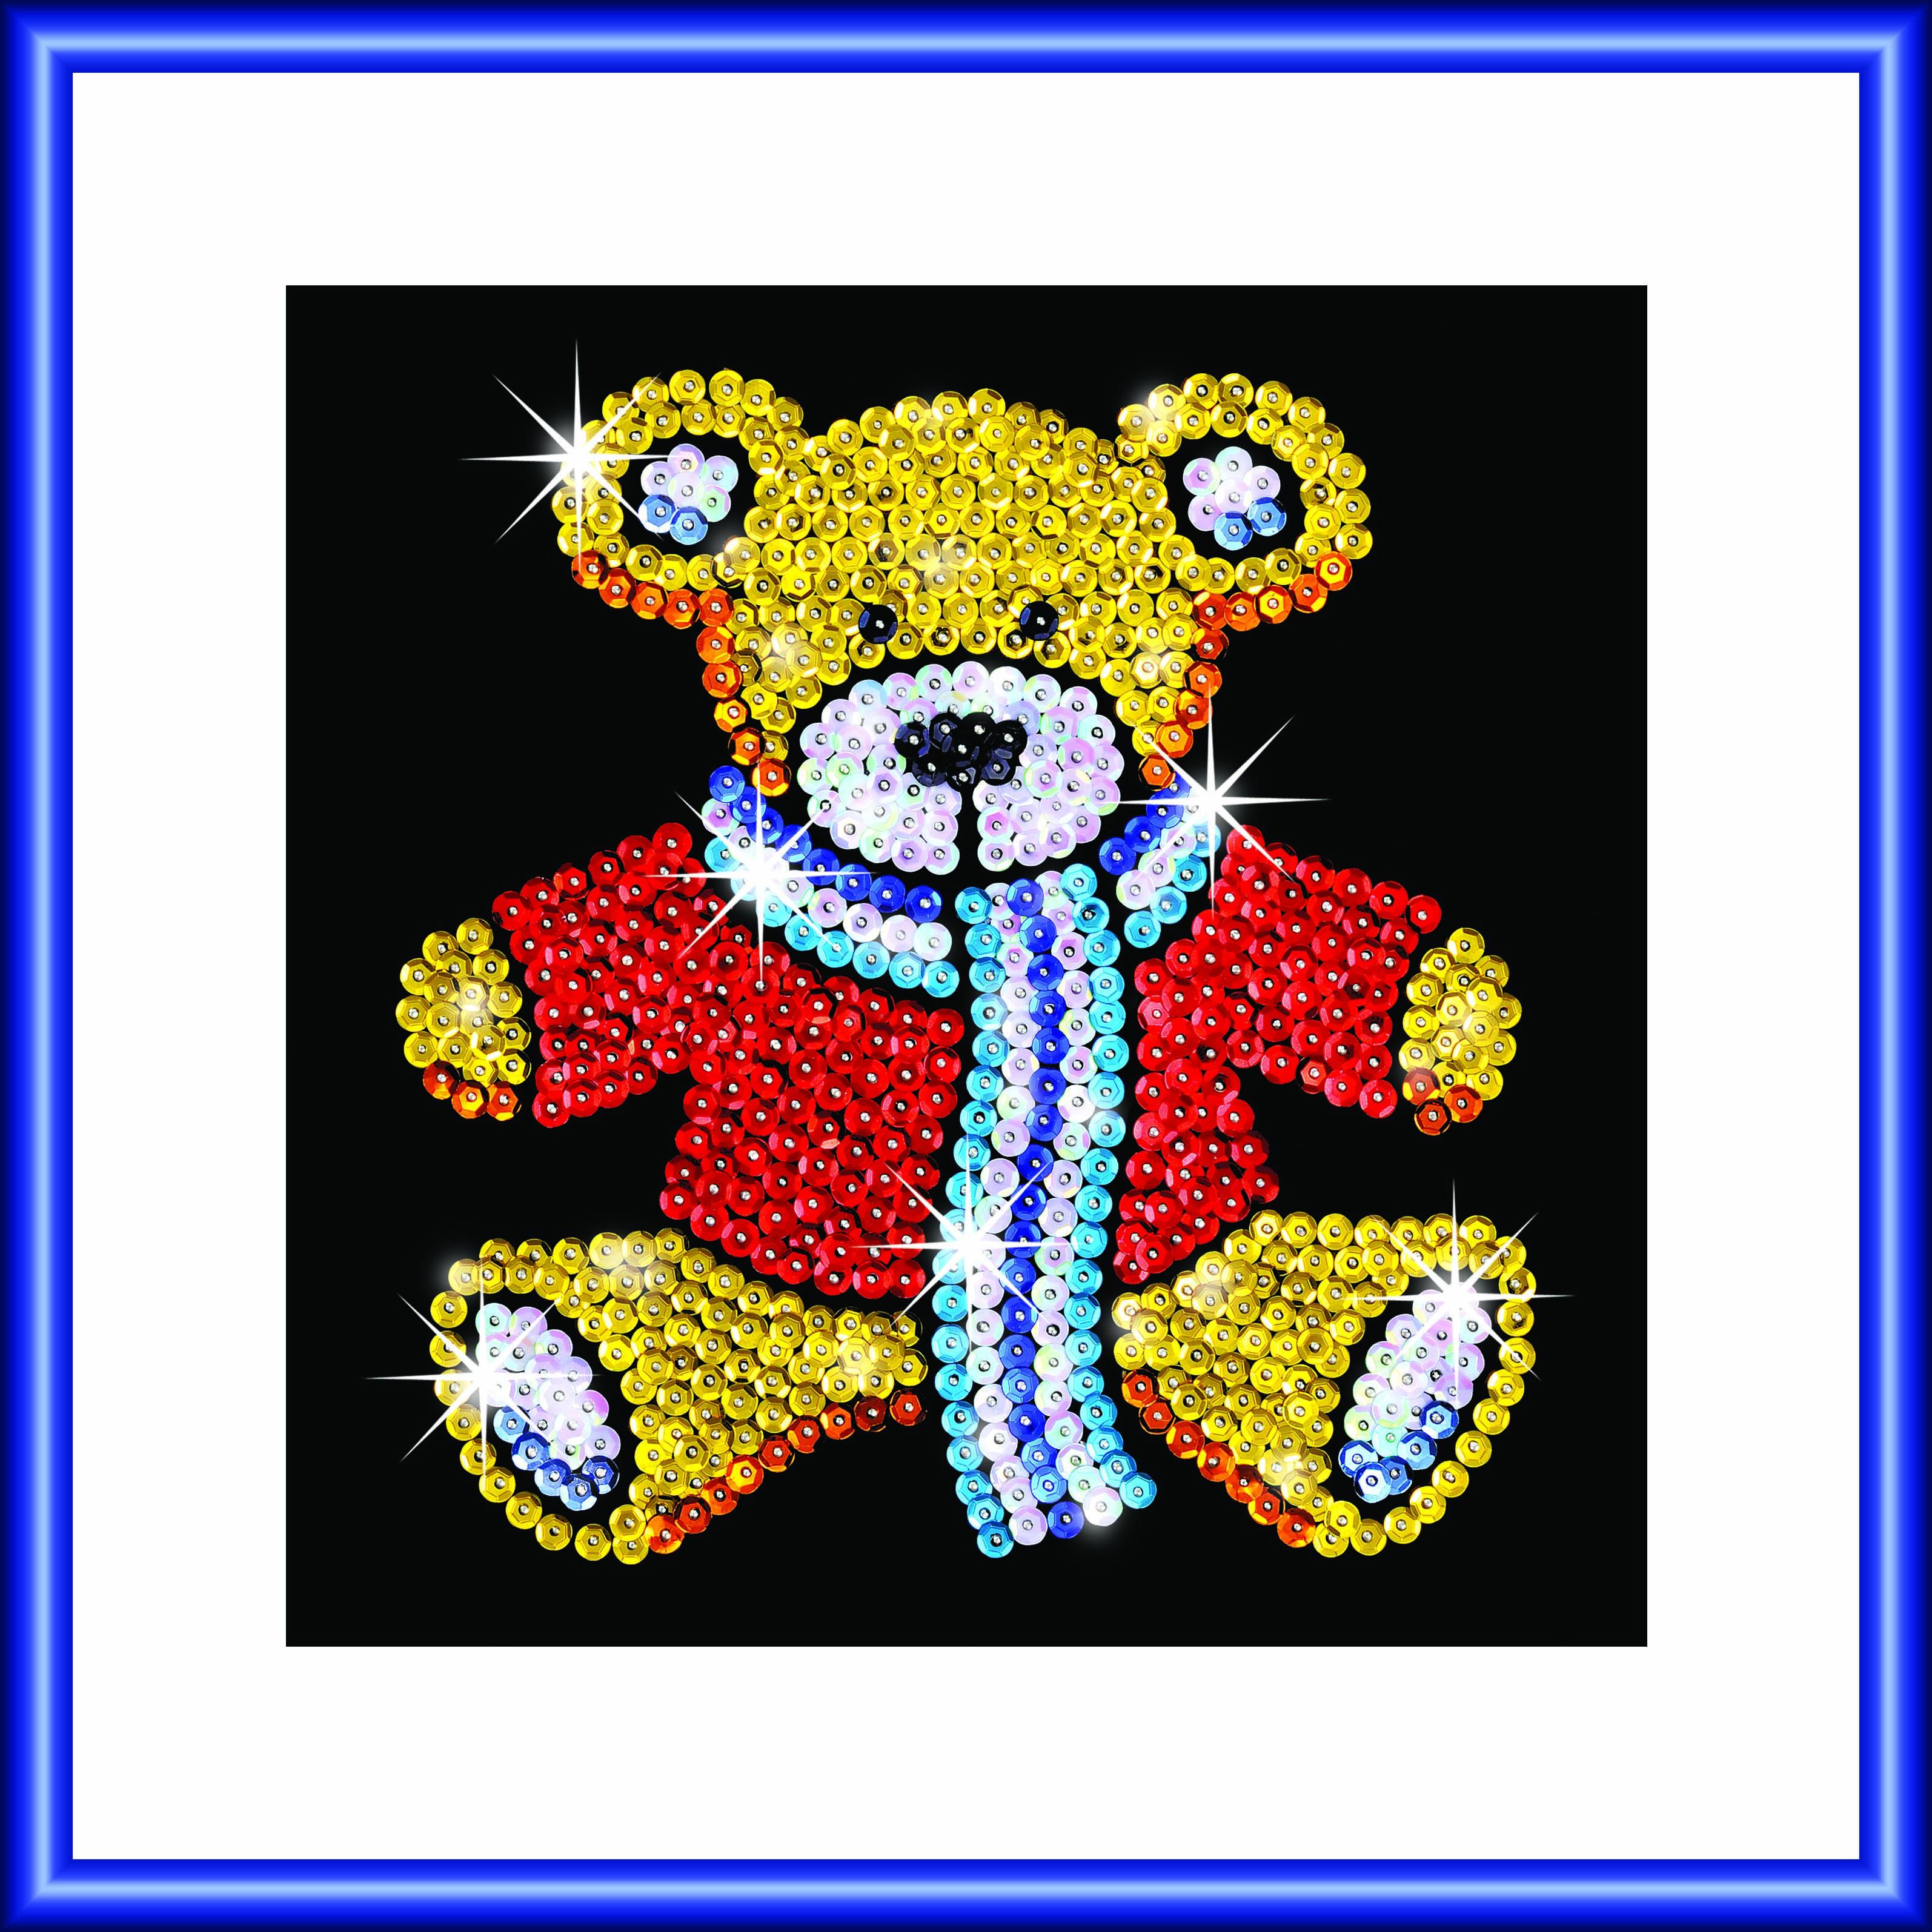 Arts and craft kits - Sequin Art Focus Teddy Craft Kit 1117 Hobbies